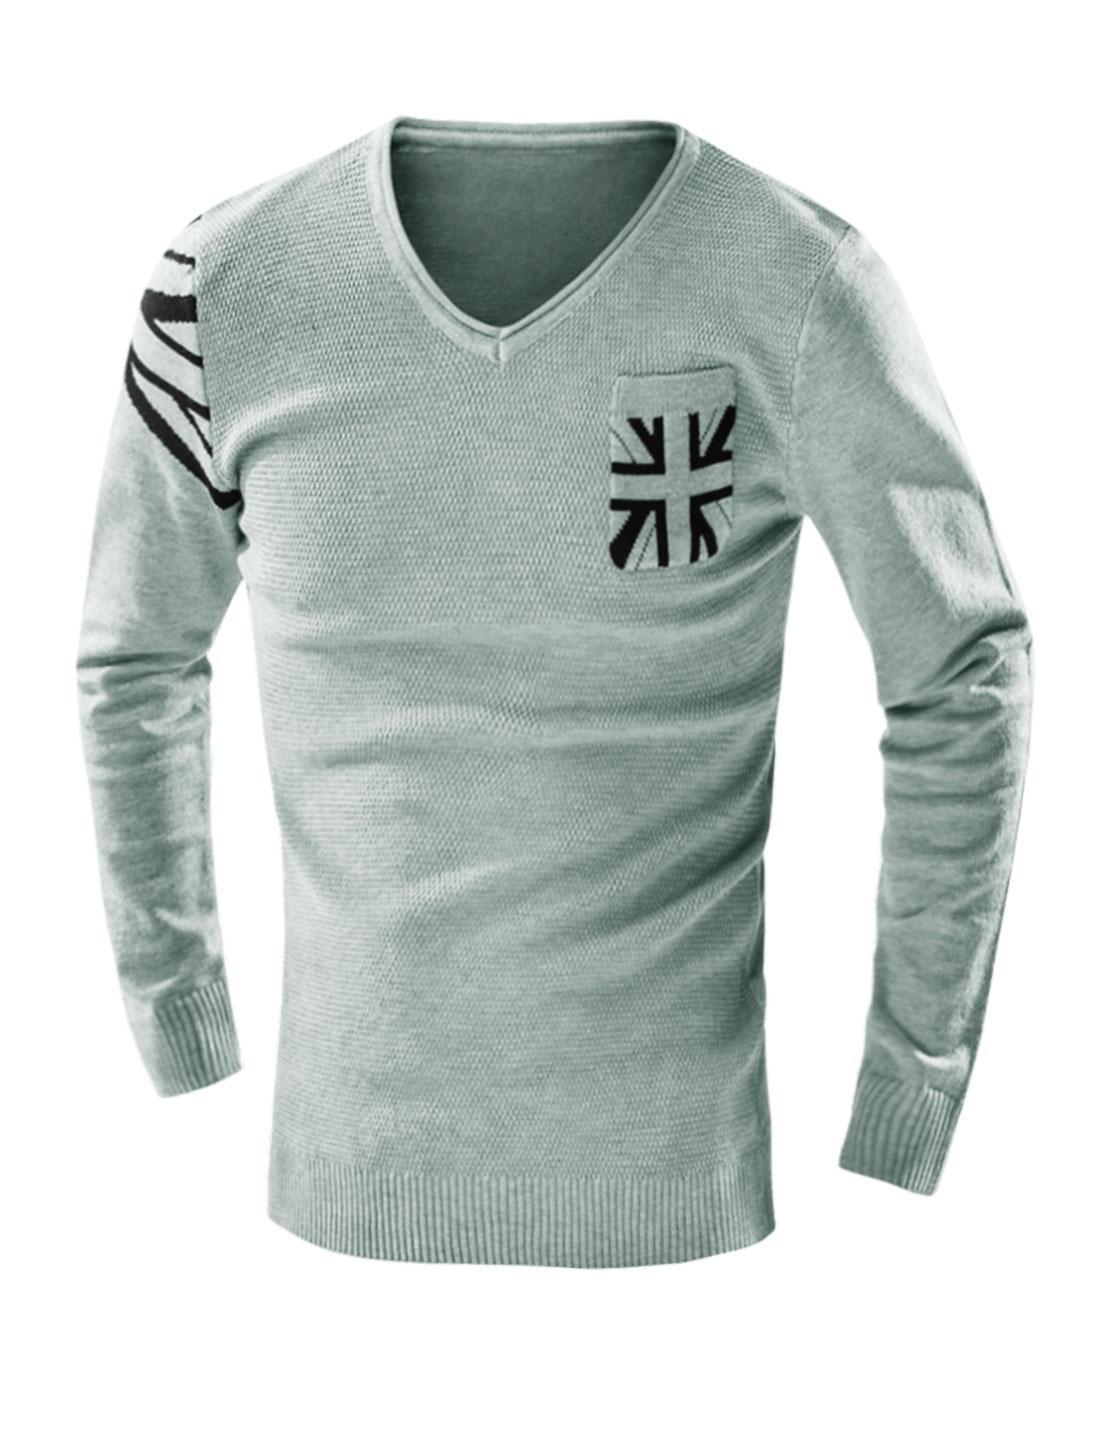 Man Union Jack Flag Knit Shirt w Pocket Light Gray